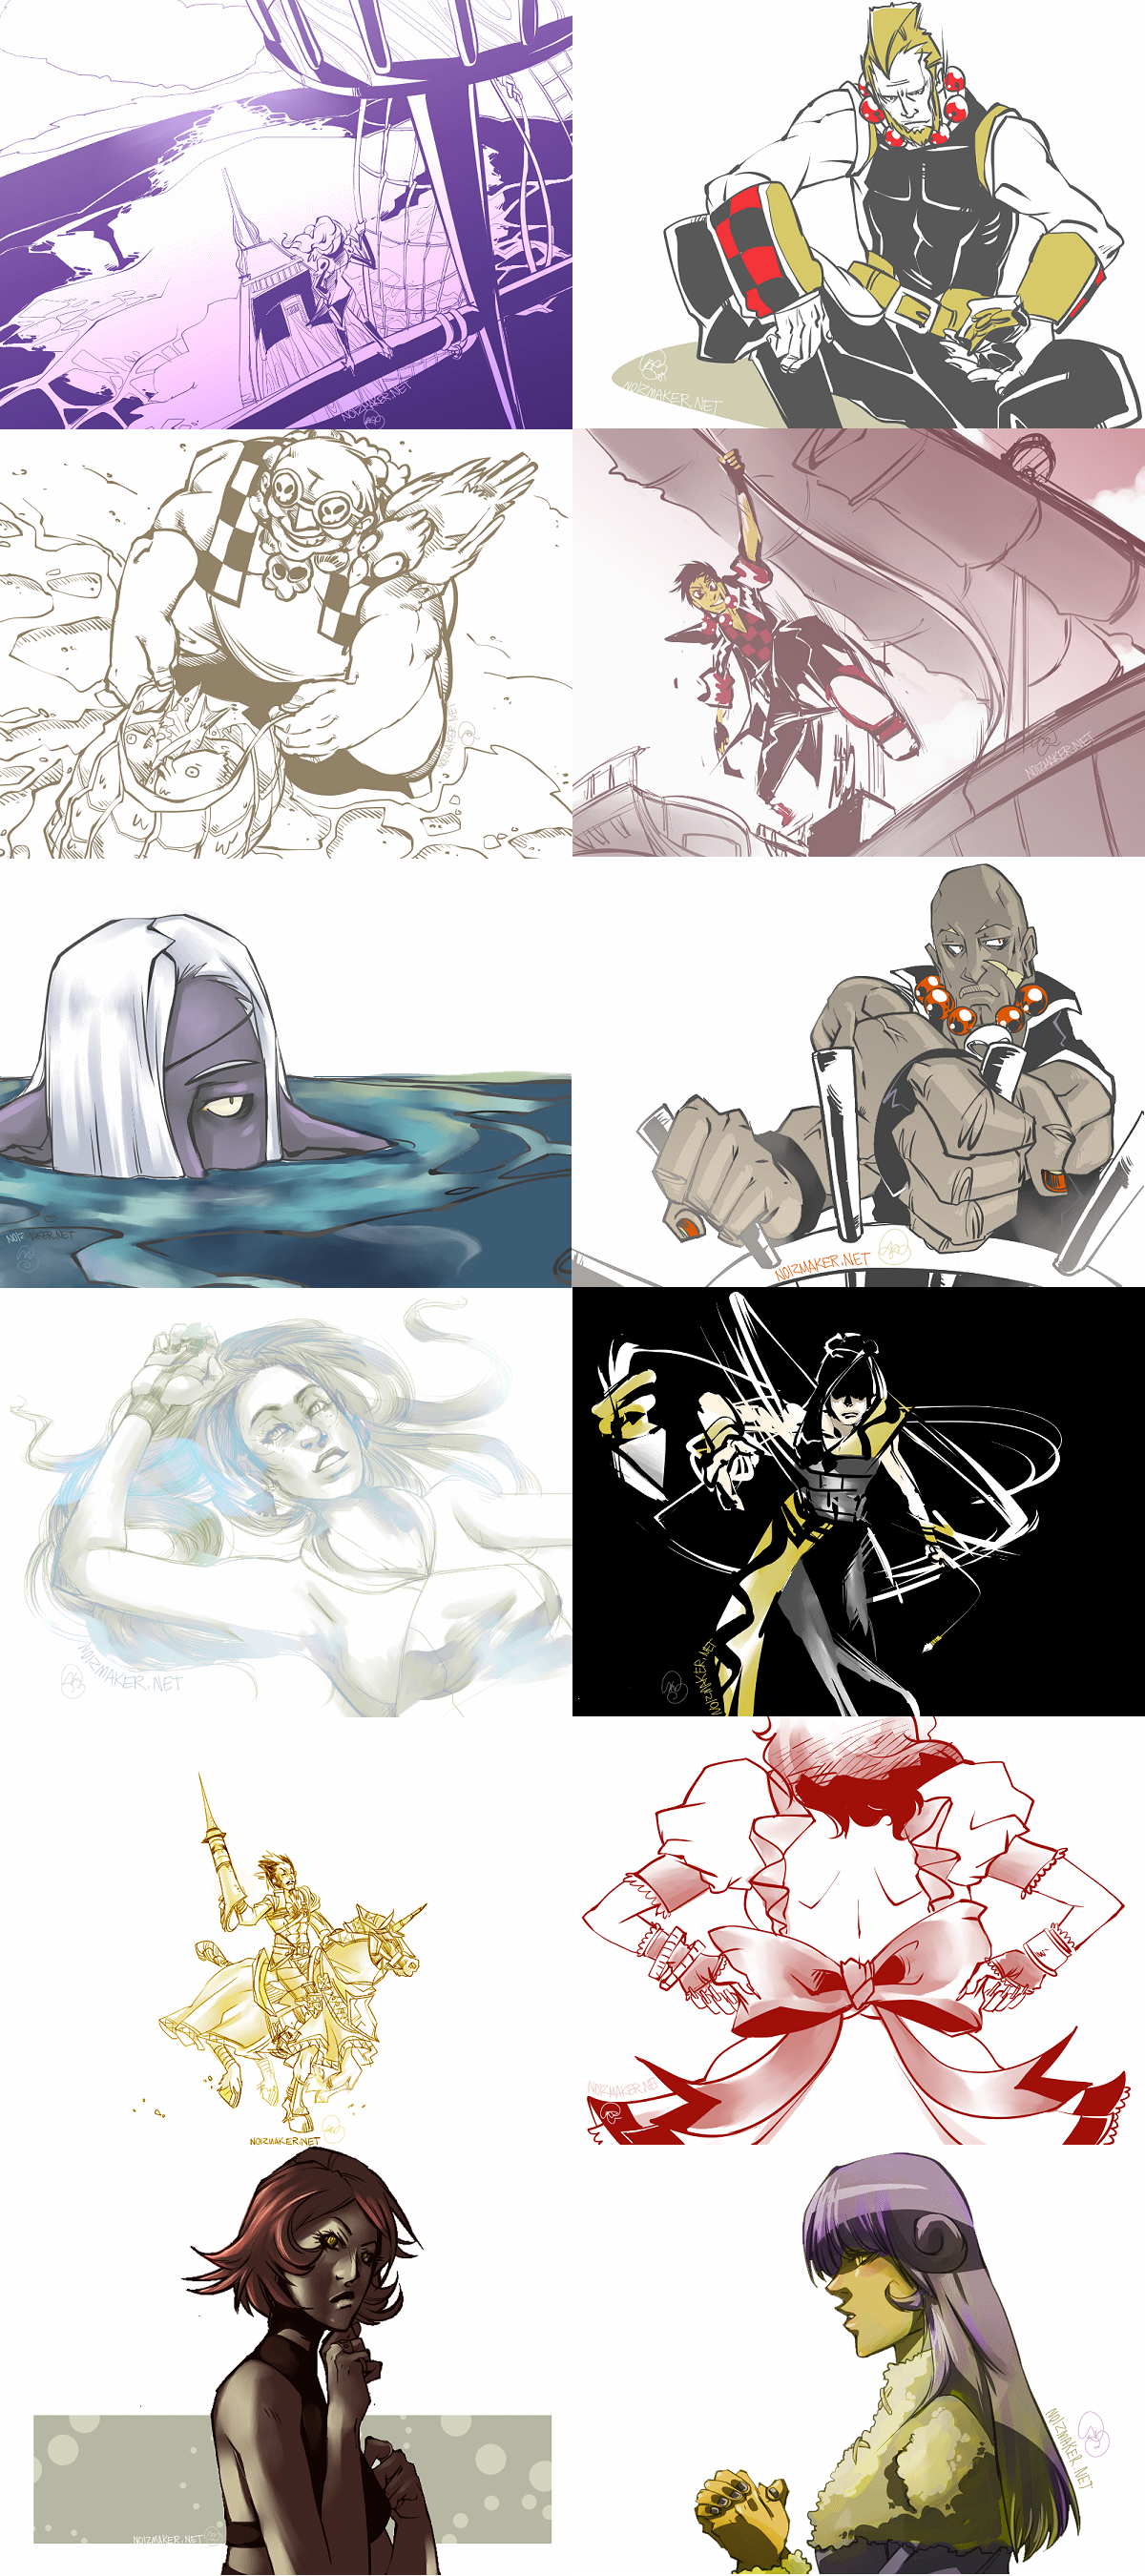 3 Pillars: Daily Sketches 002 by karniz